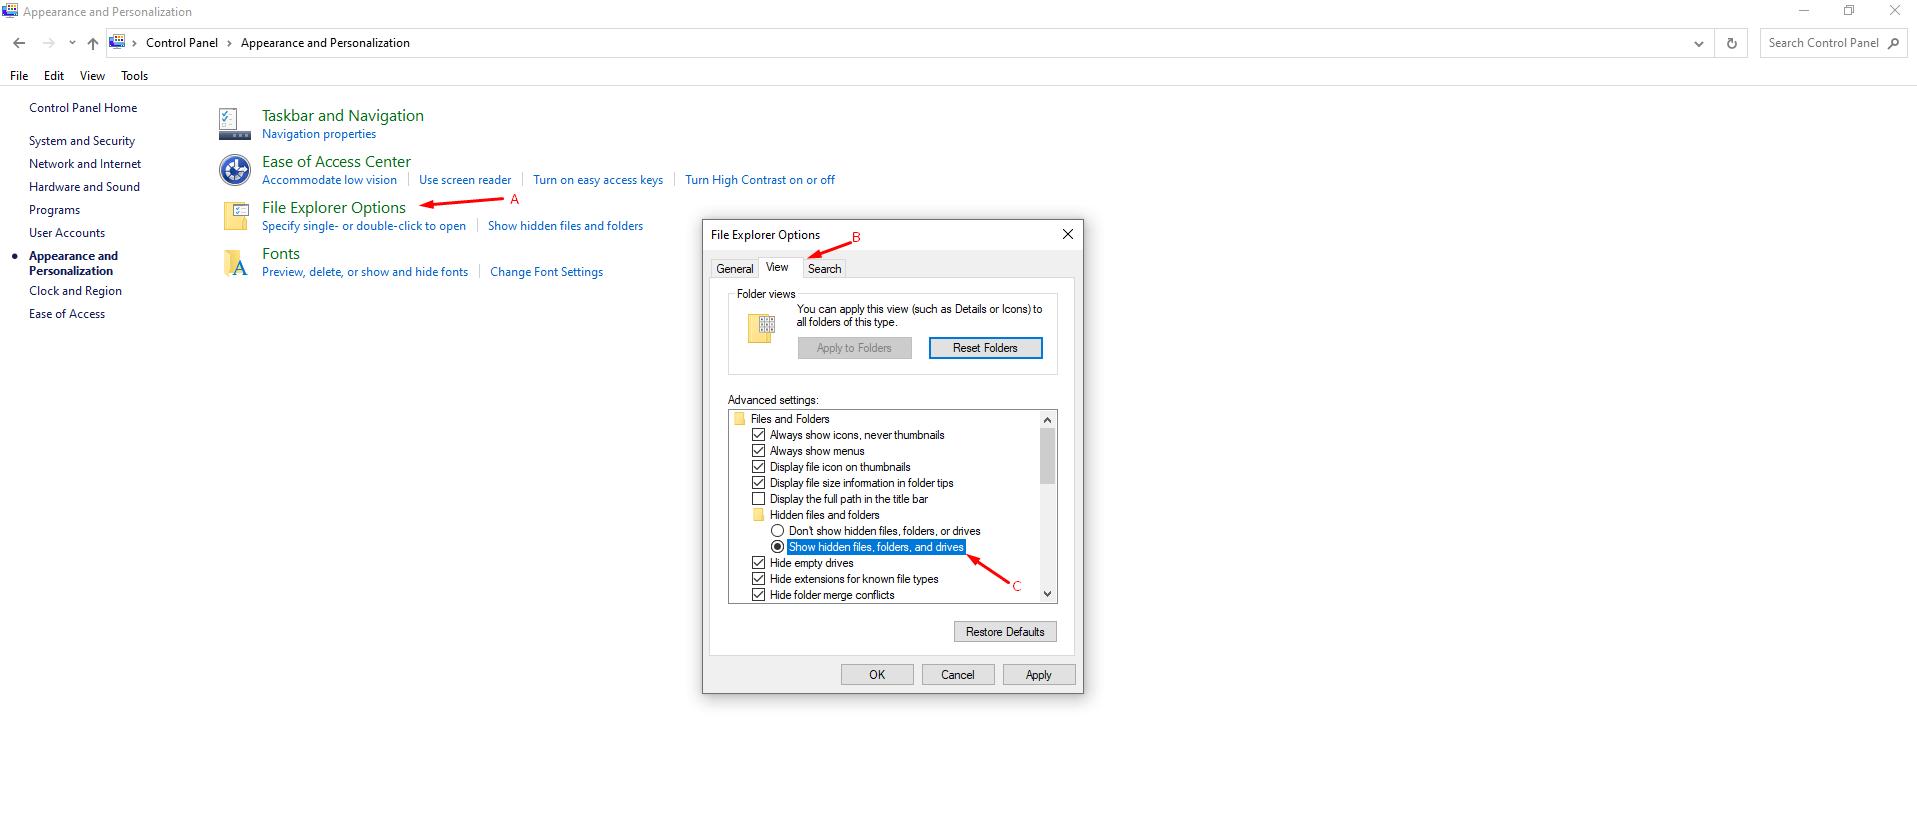 View Hidden Files